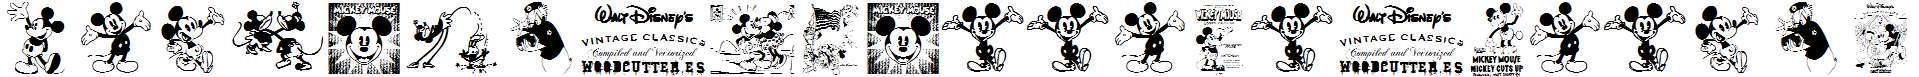 Vintage-Classics-Disney